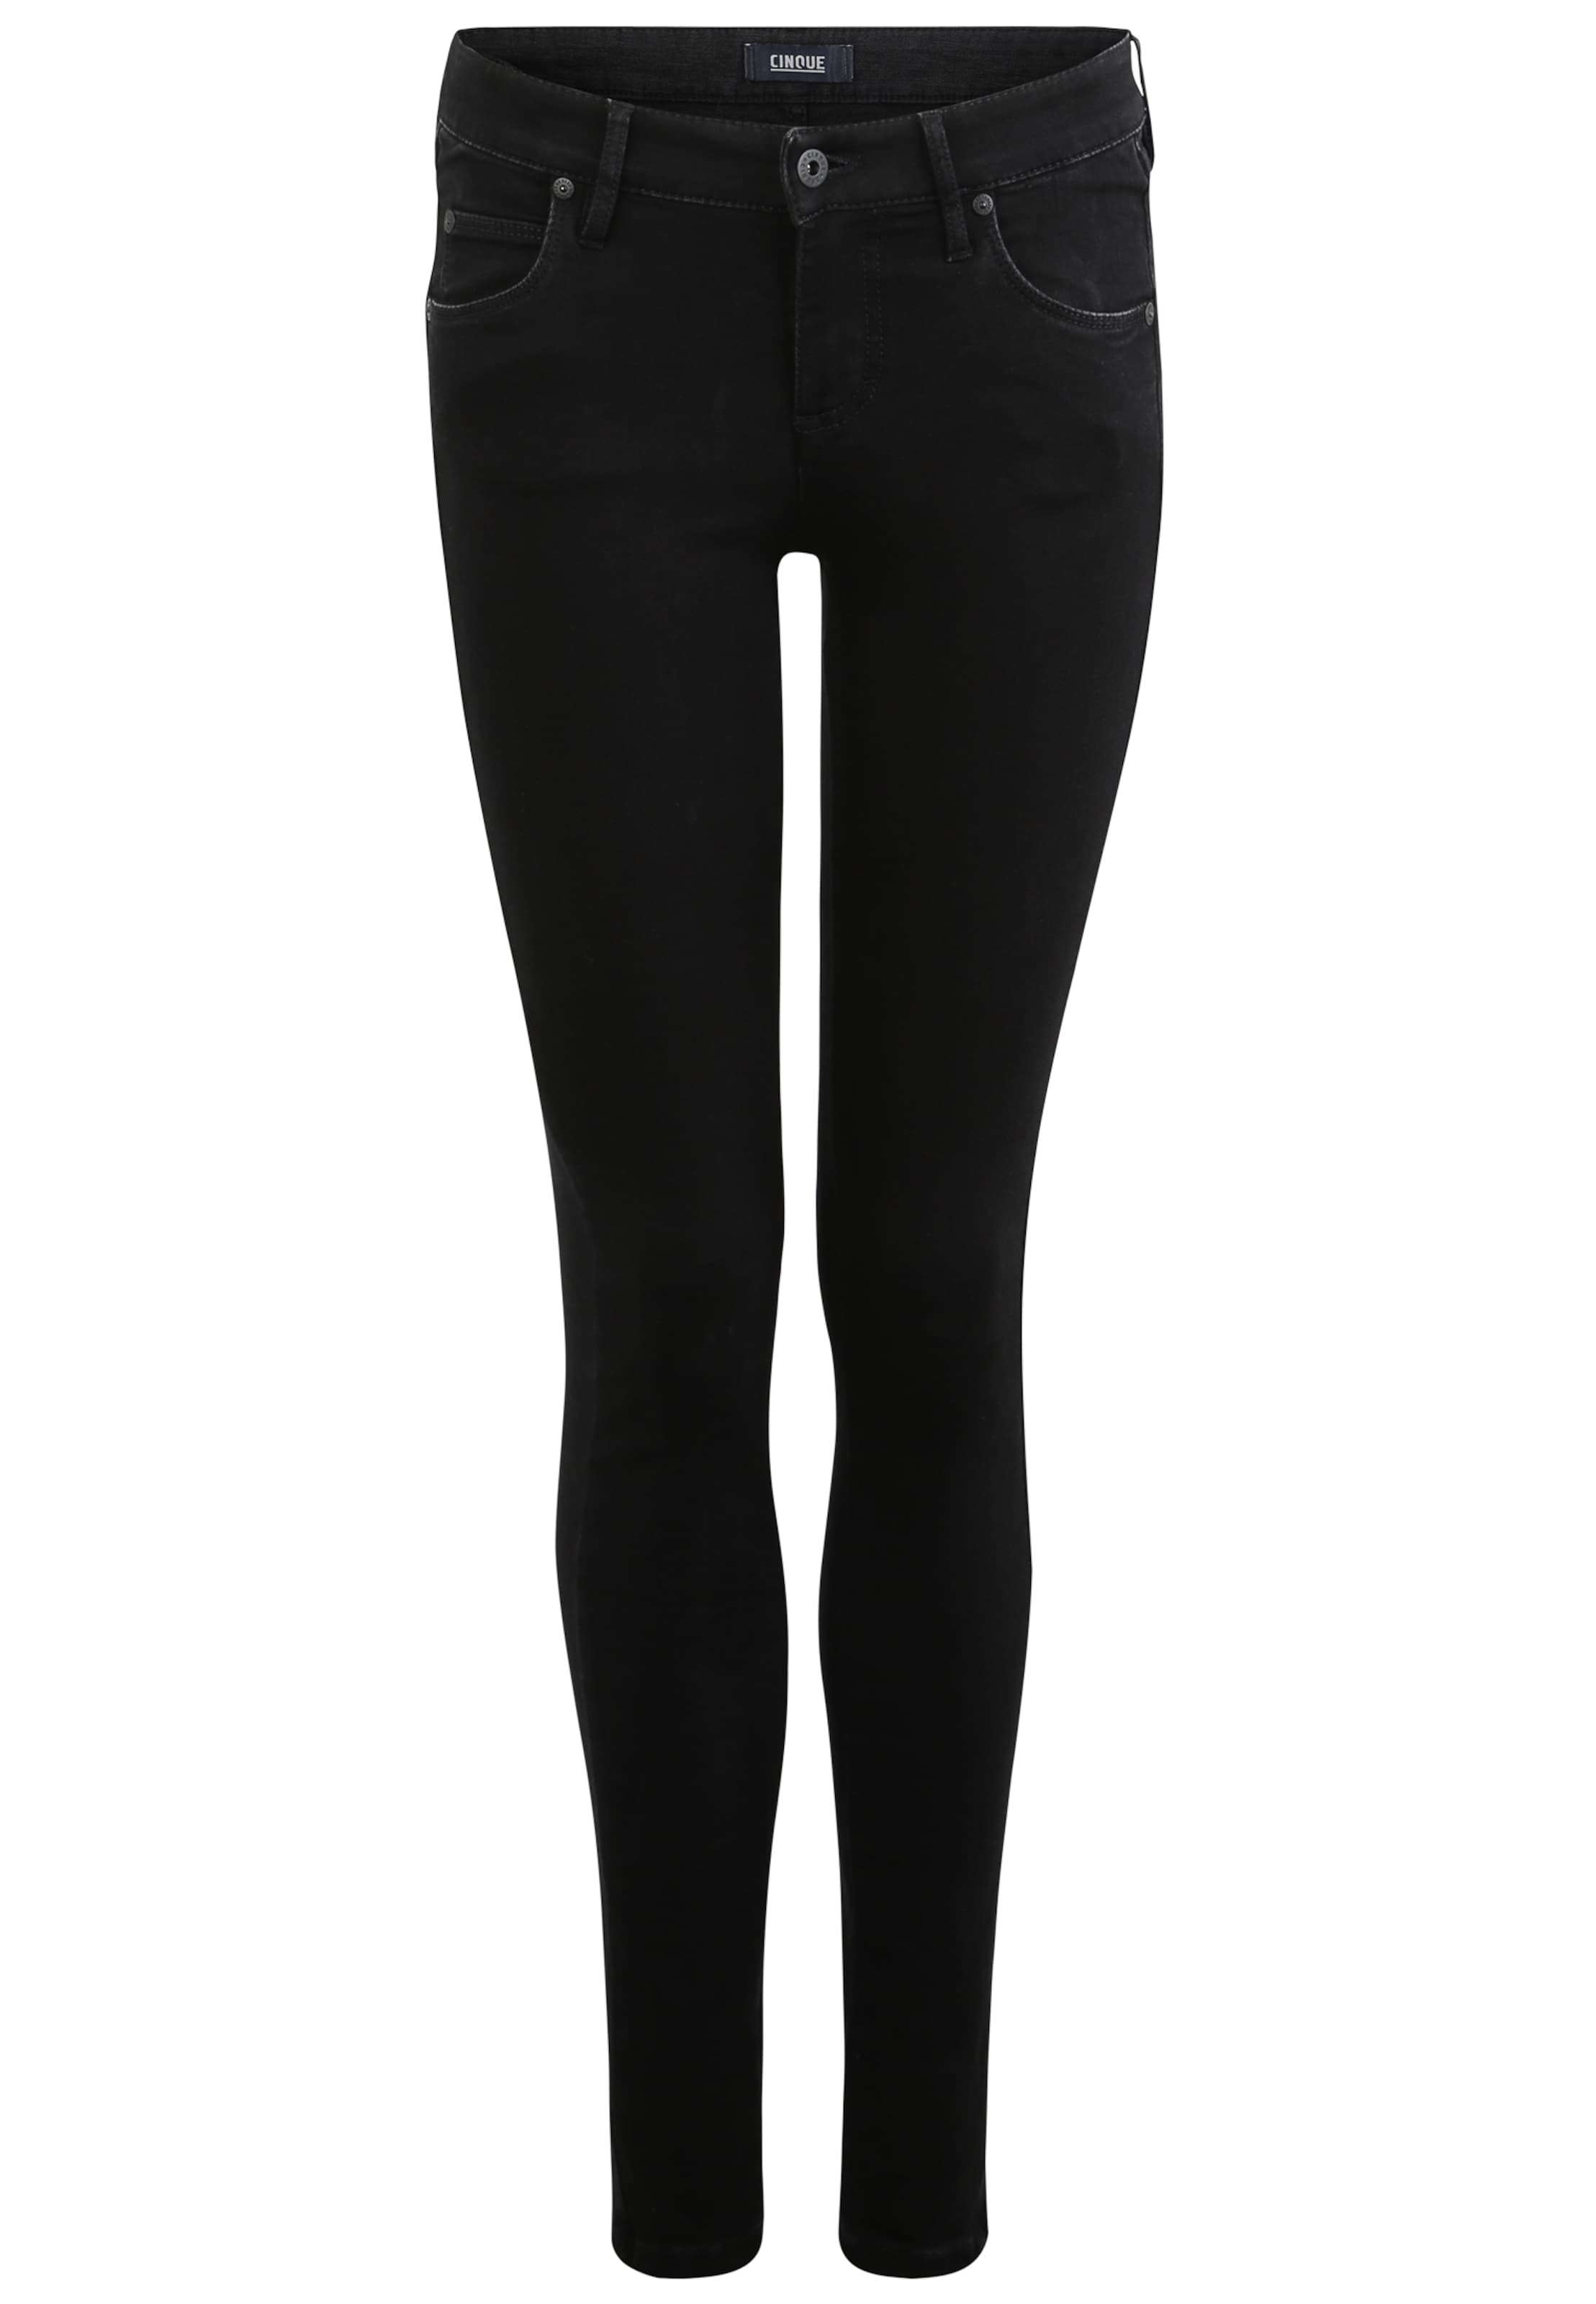 'ciskinny' Schwarz Cinque Jeans In 0nPk8OwX